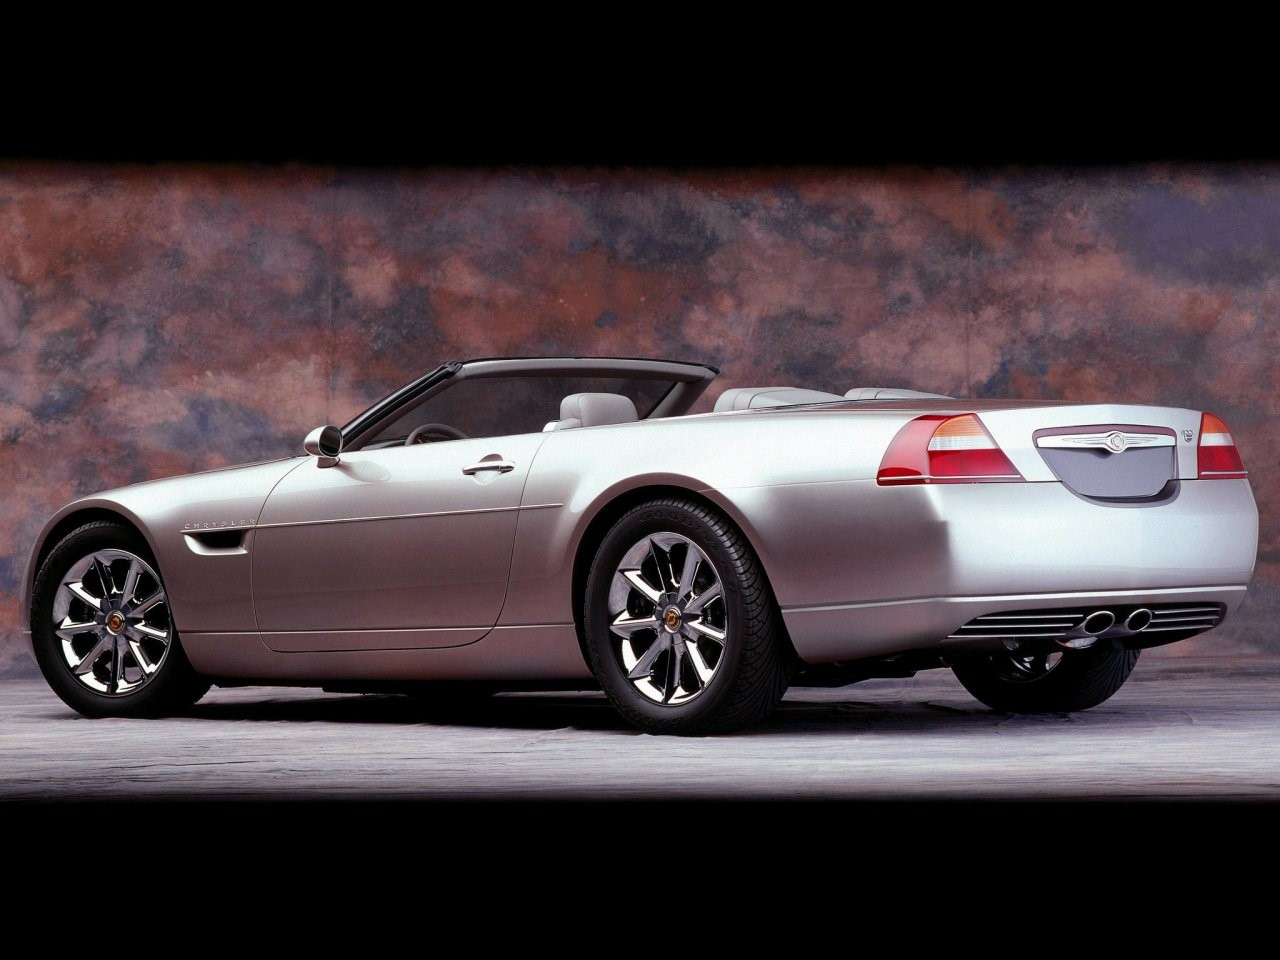 2000 Chrysler 300C concept 5